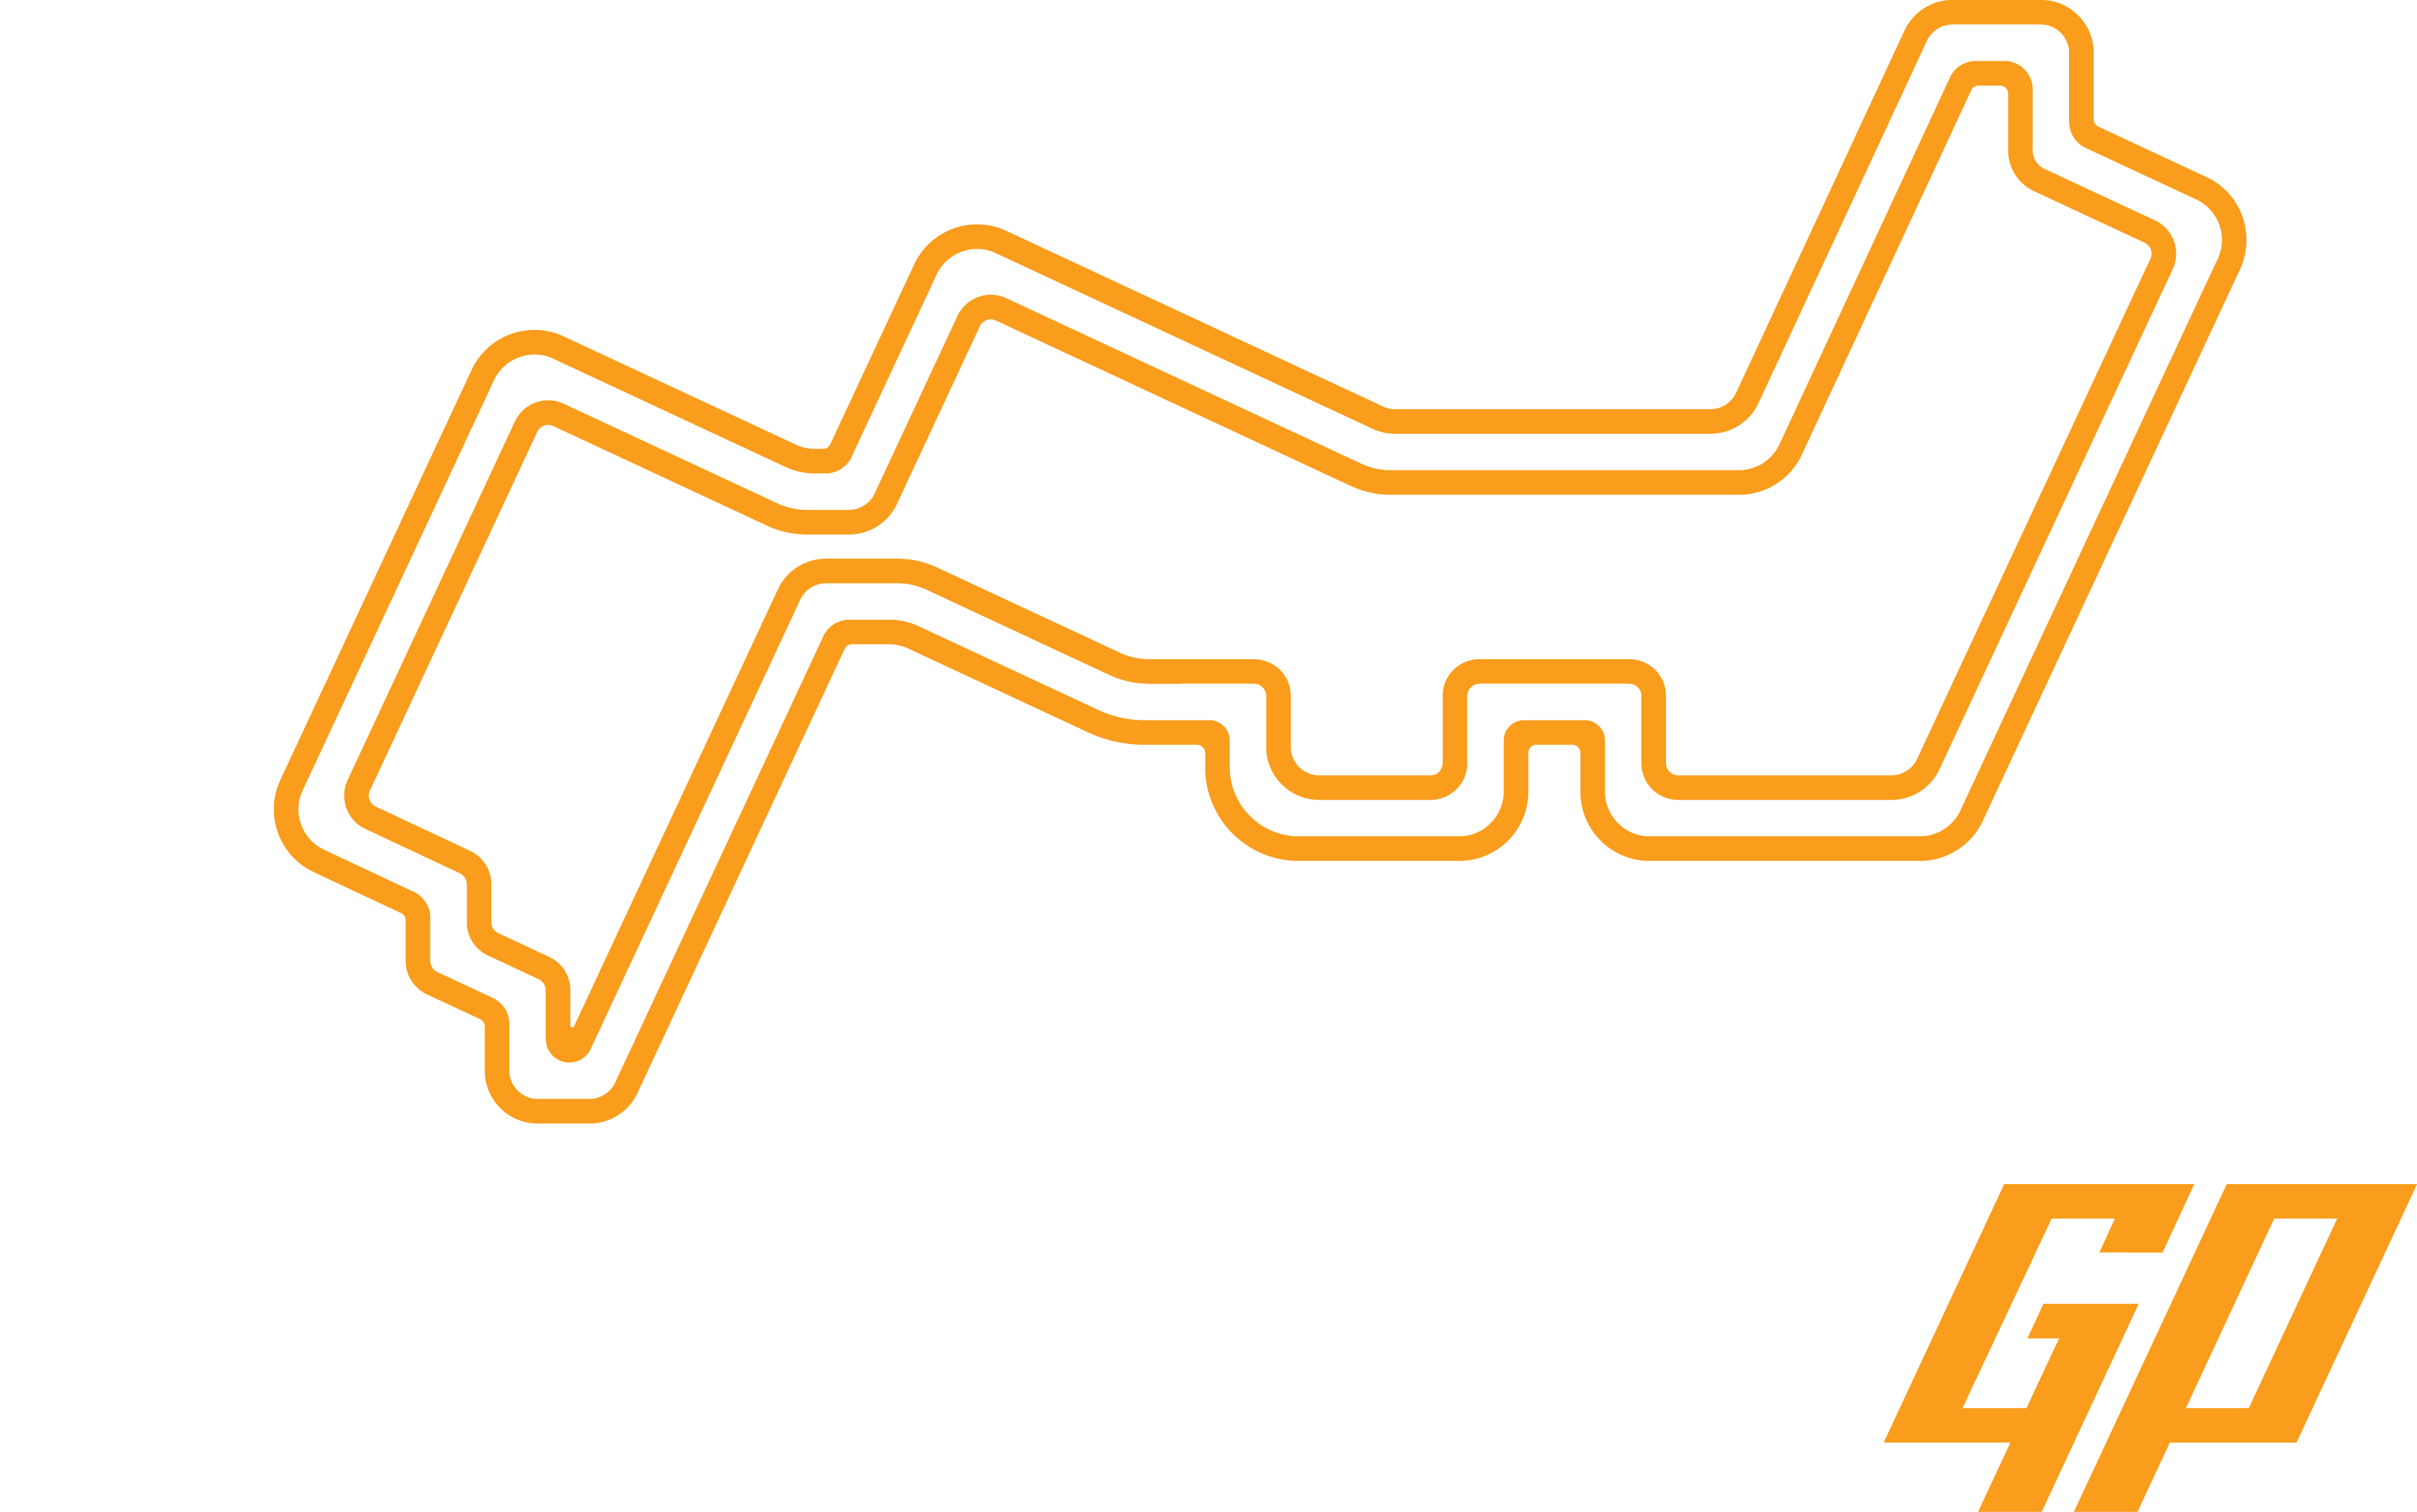 Motogp Spanish Grand Prix | MotoGP 2017 Info, Video, Points Table